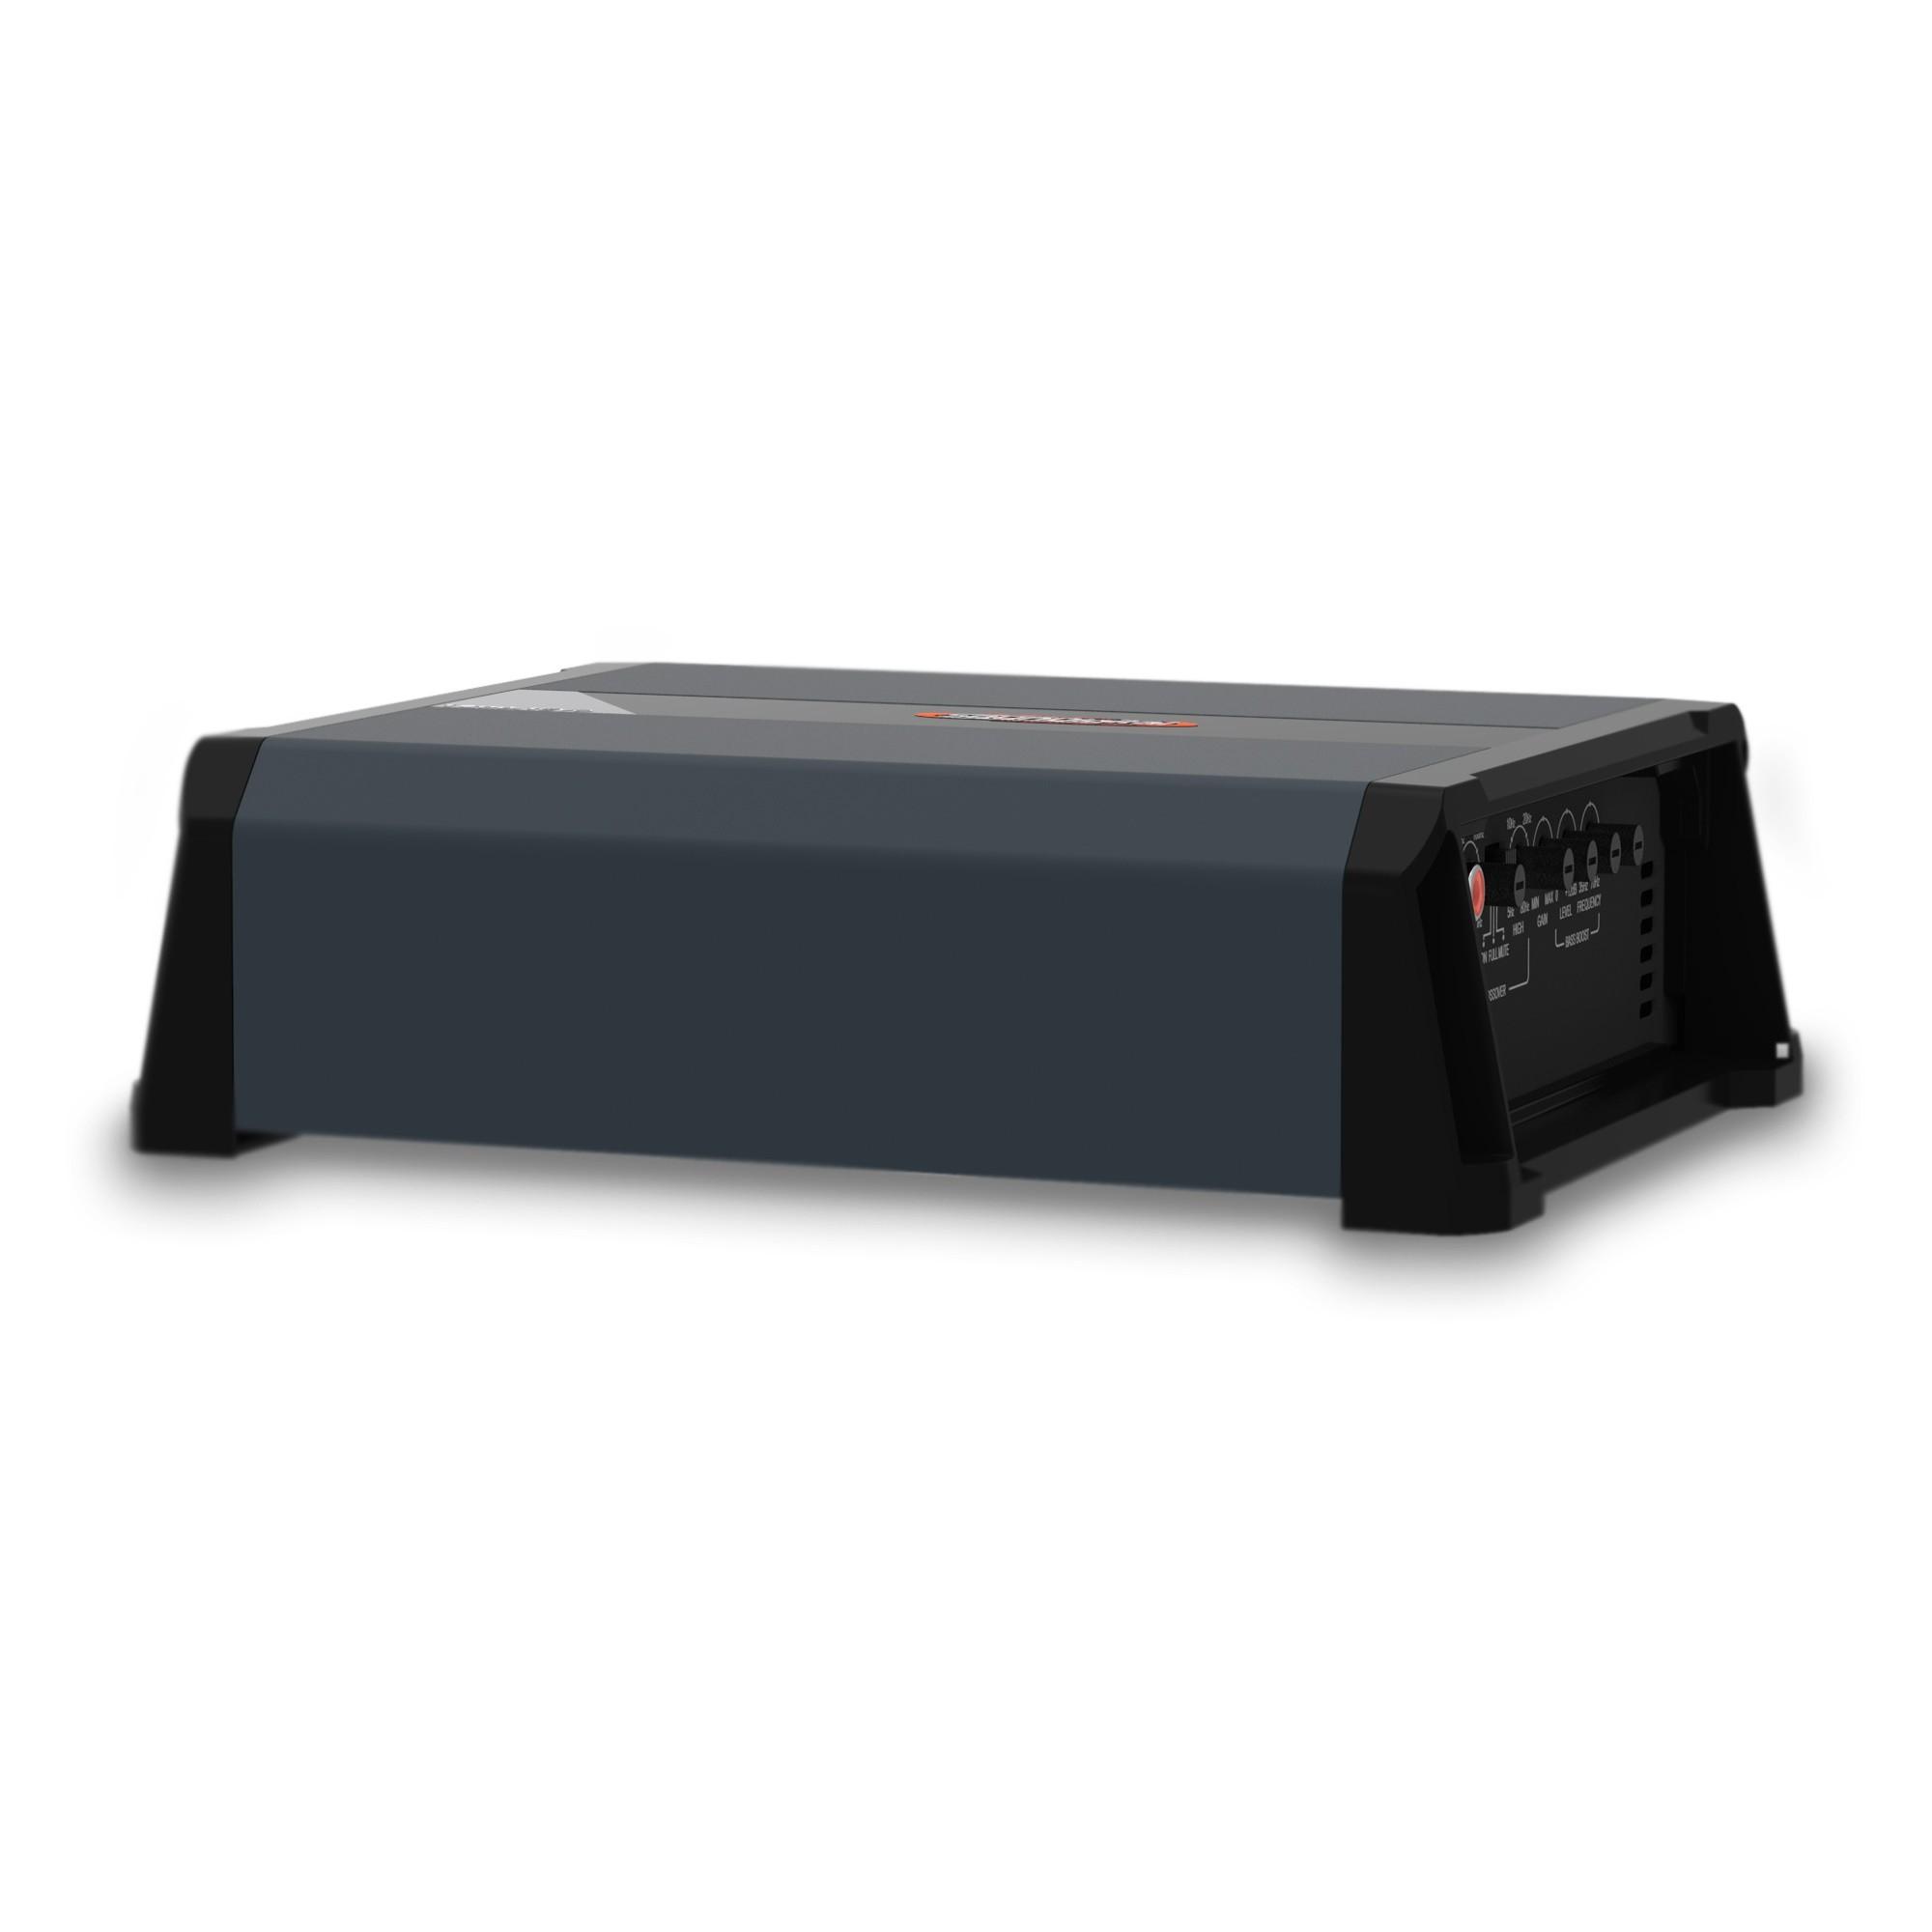 Módulo Amplificador Soundigital SD 1600.1 EVO 4.0 1600W Rms 2 Ohms 1 Canal